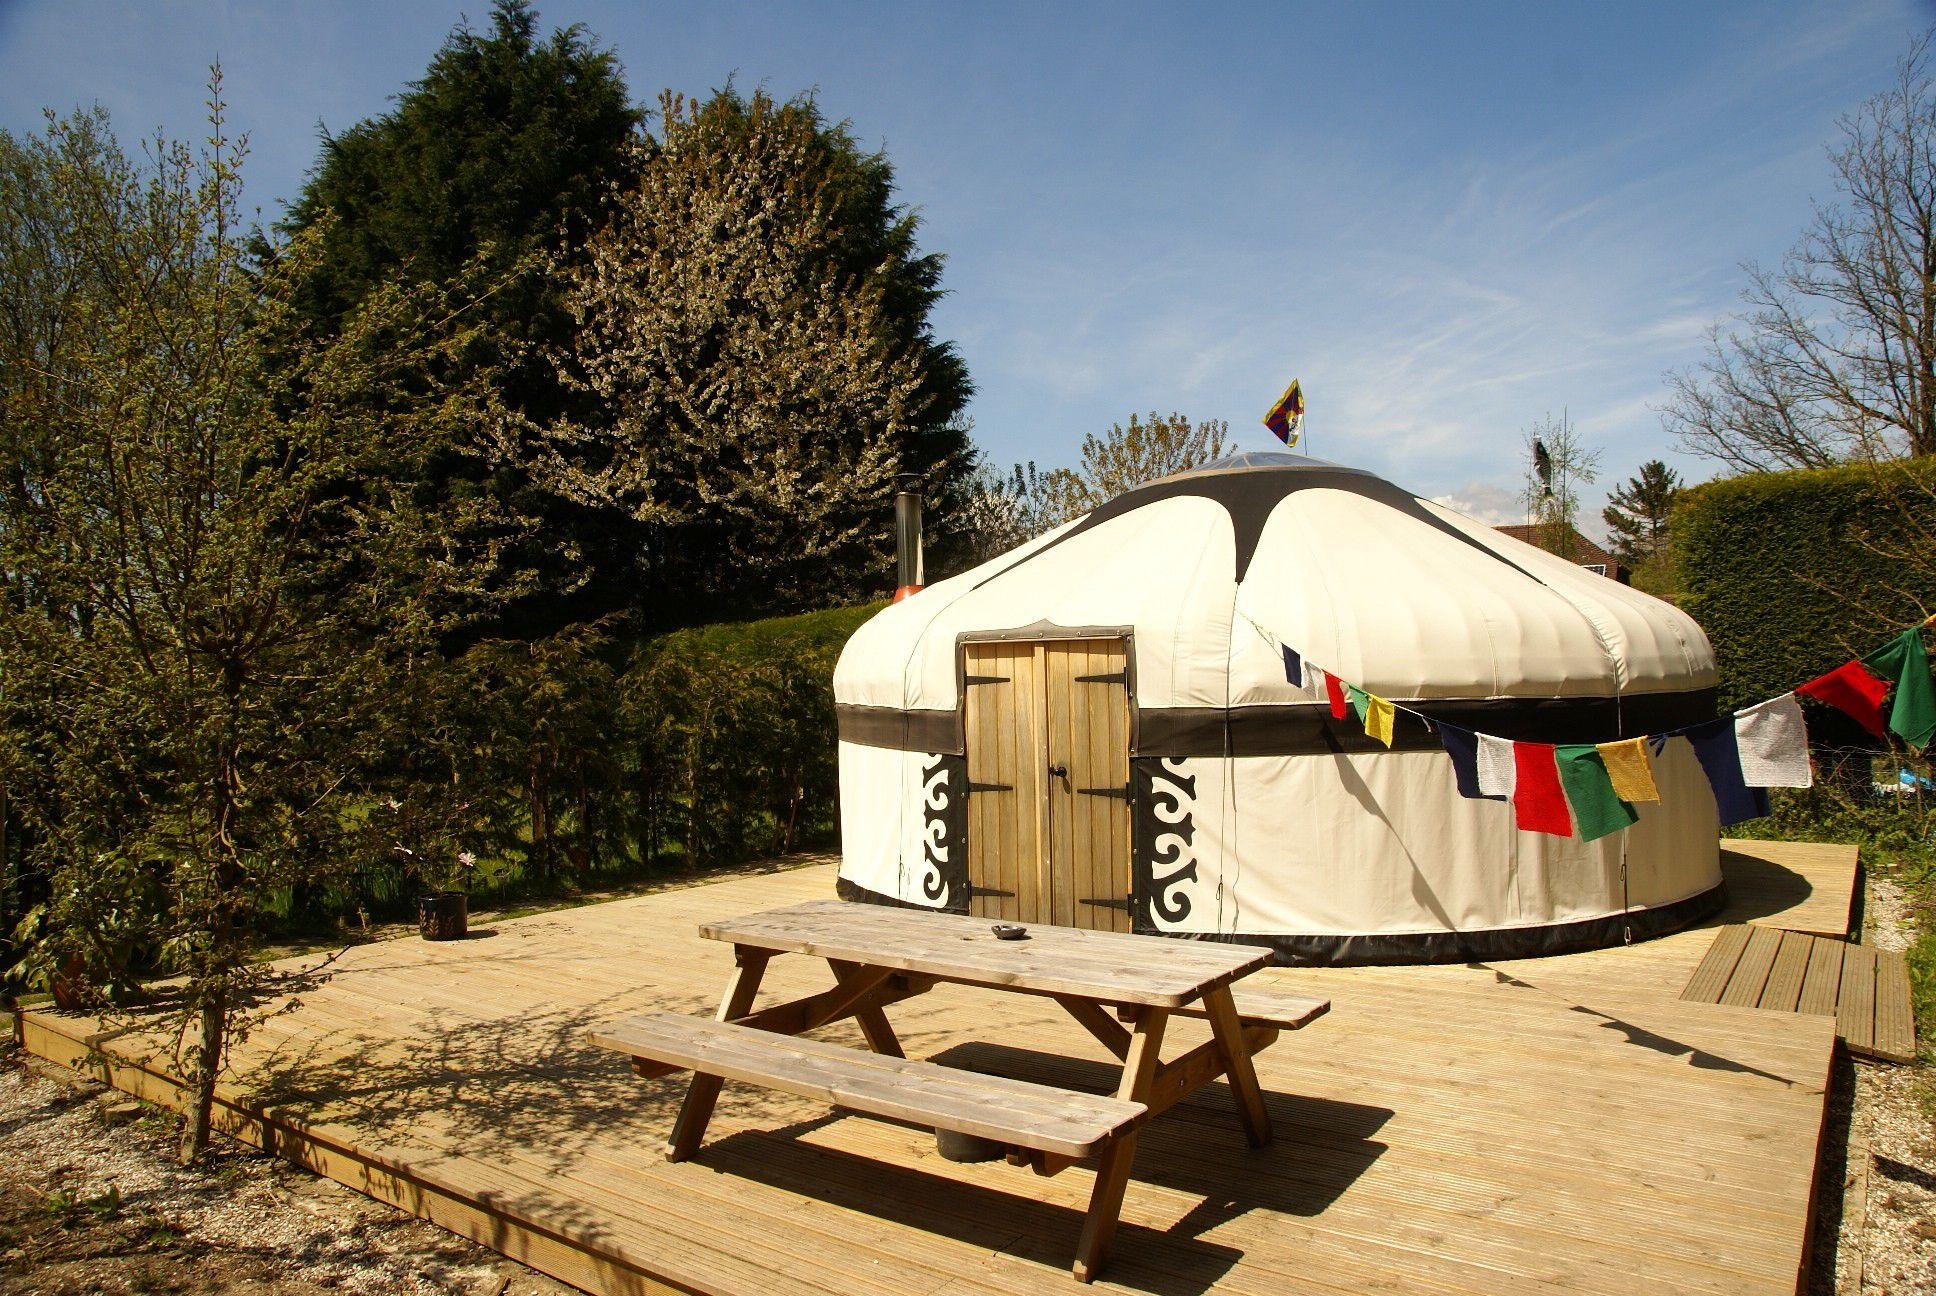 Campsites in Rye – I Love This Campsite